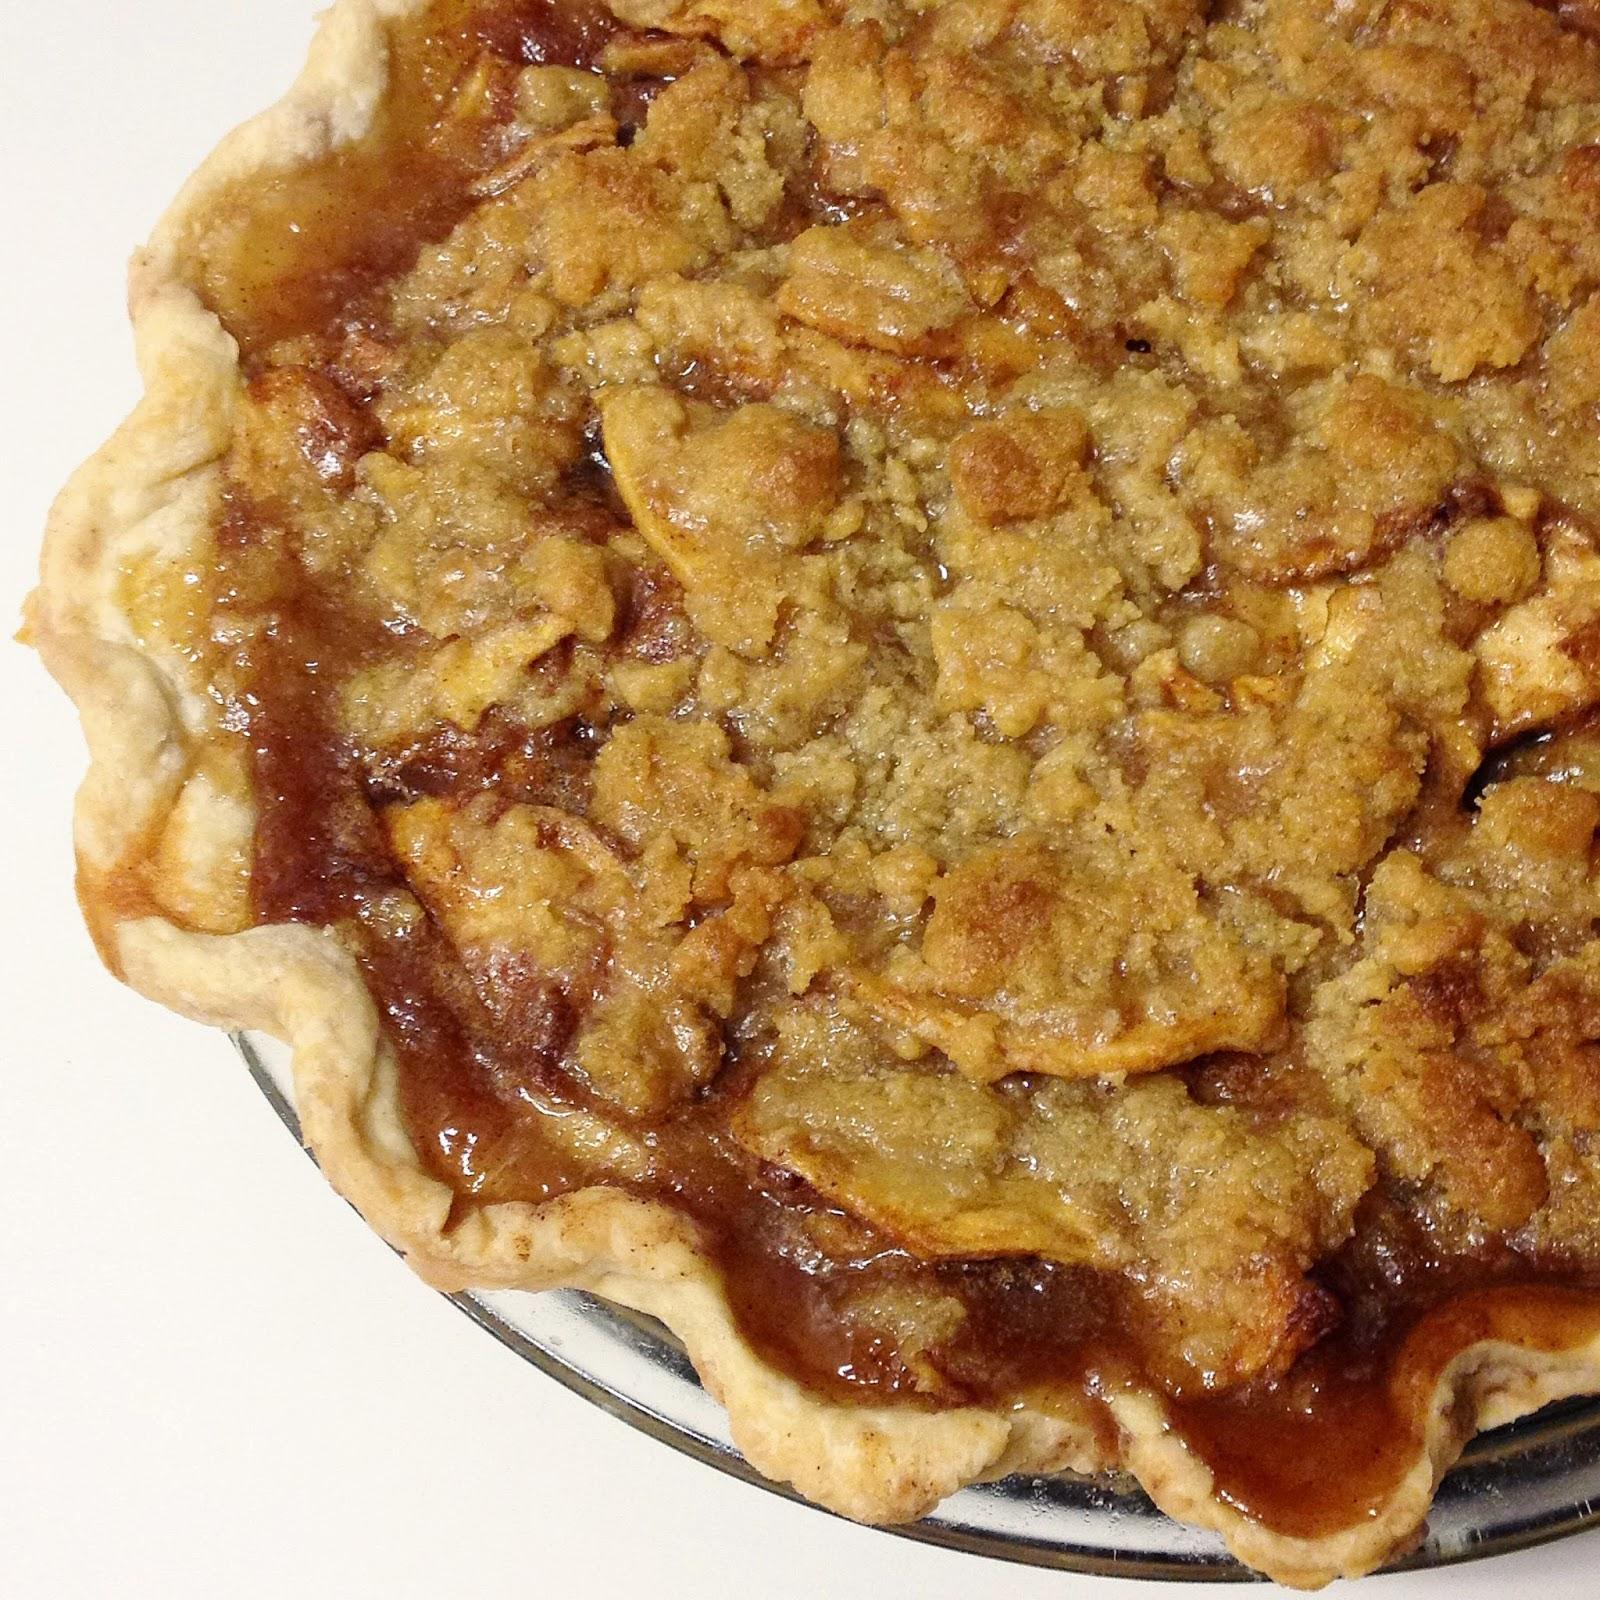 Cinnamon Pie Crust